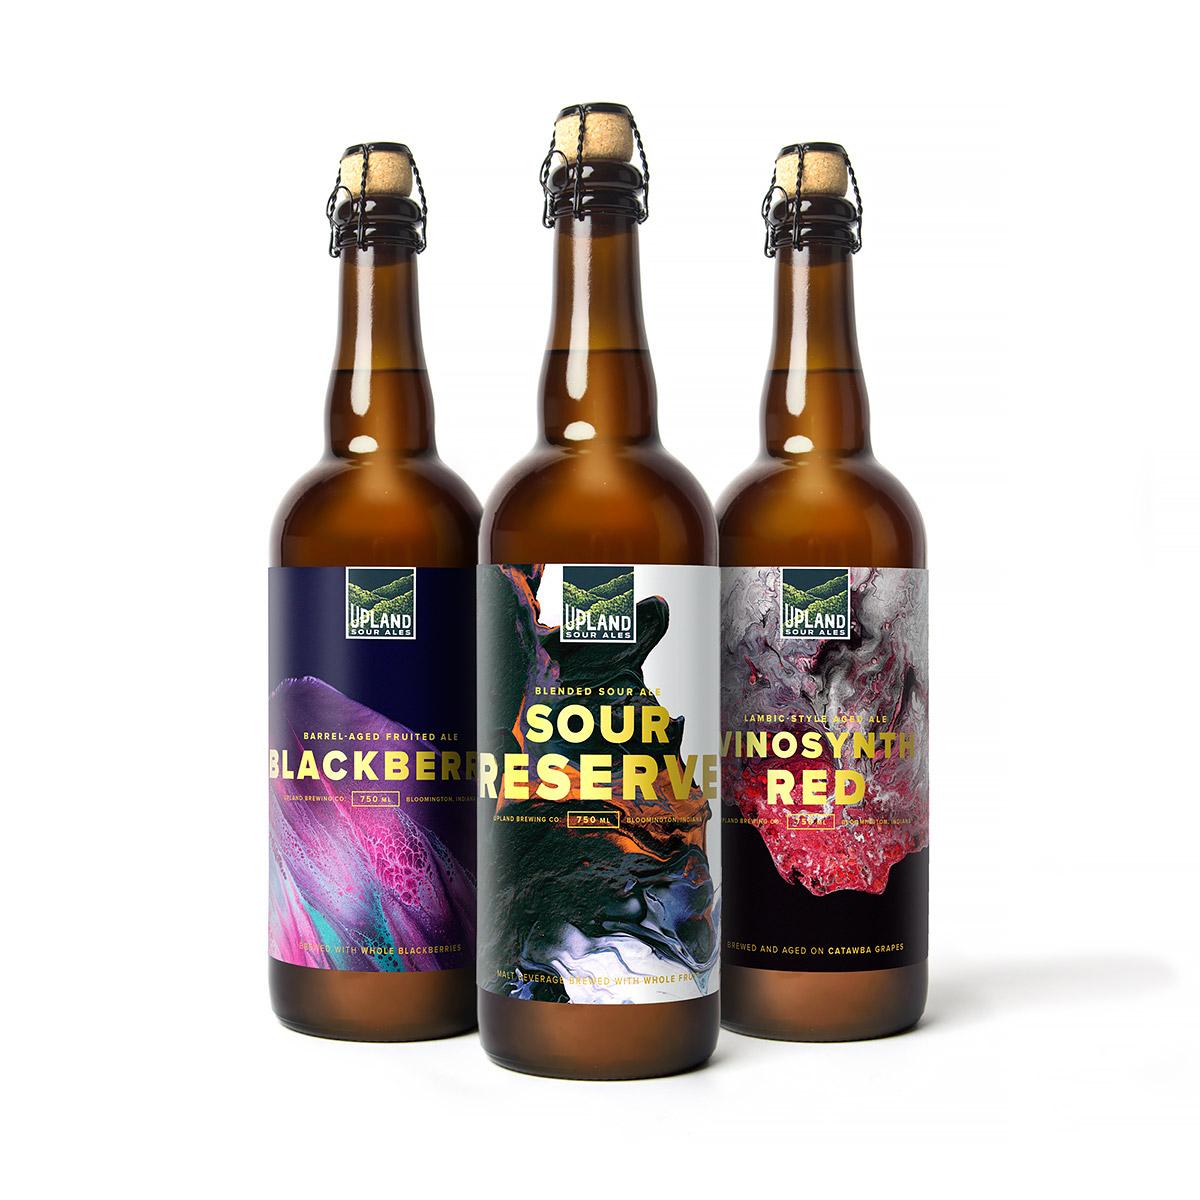 Upland Sour Ales創意啤酒包裝設計